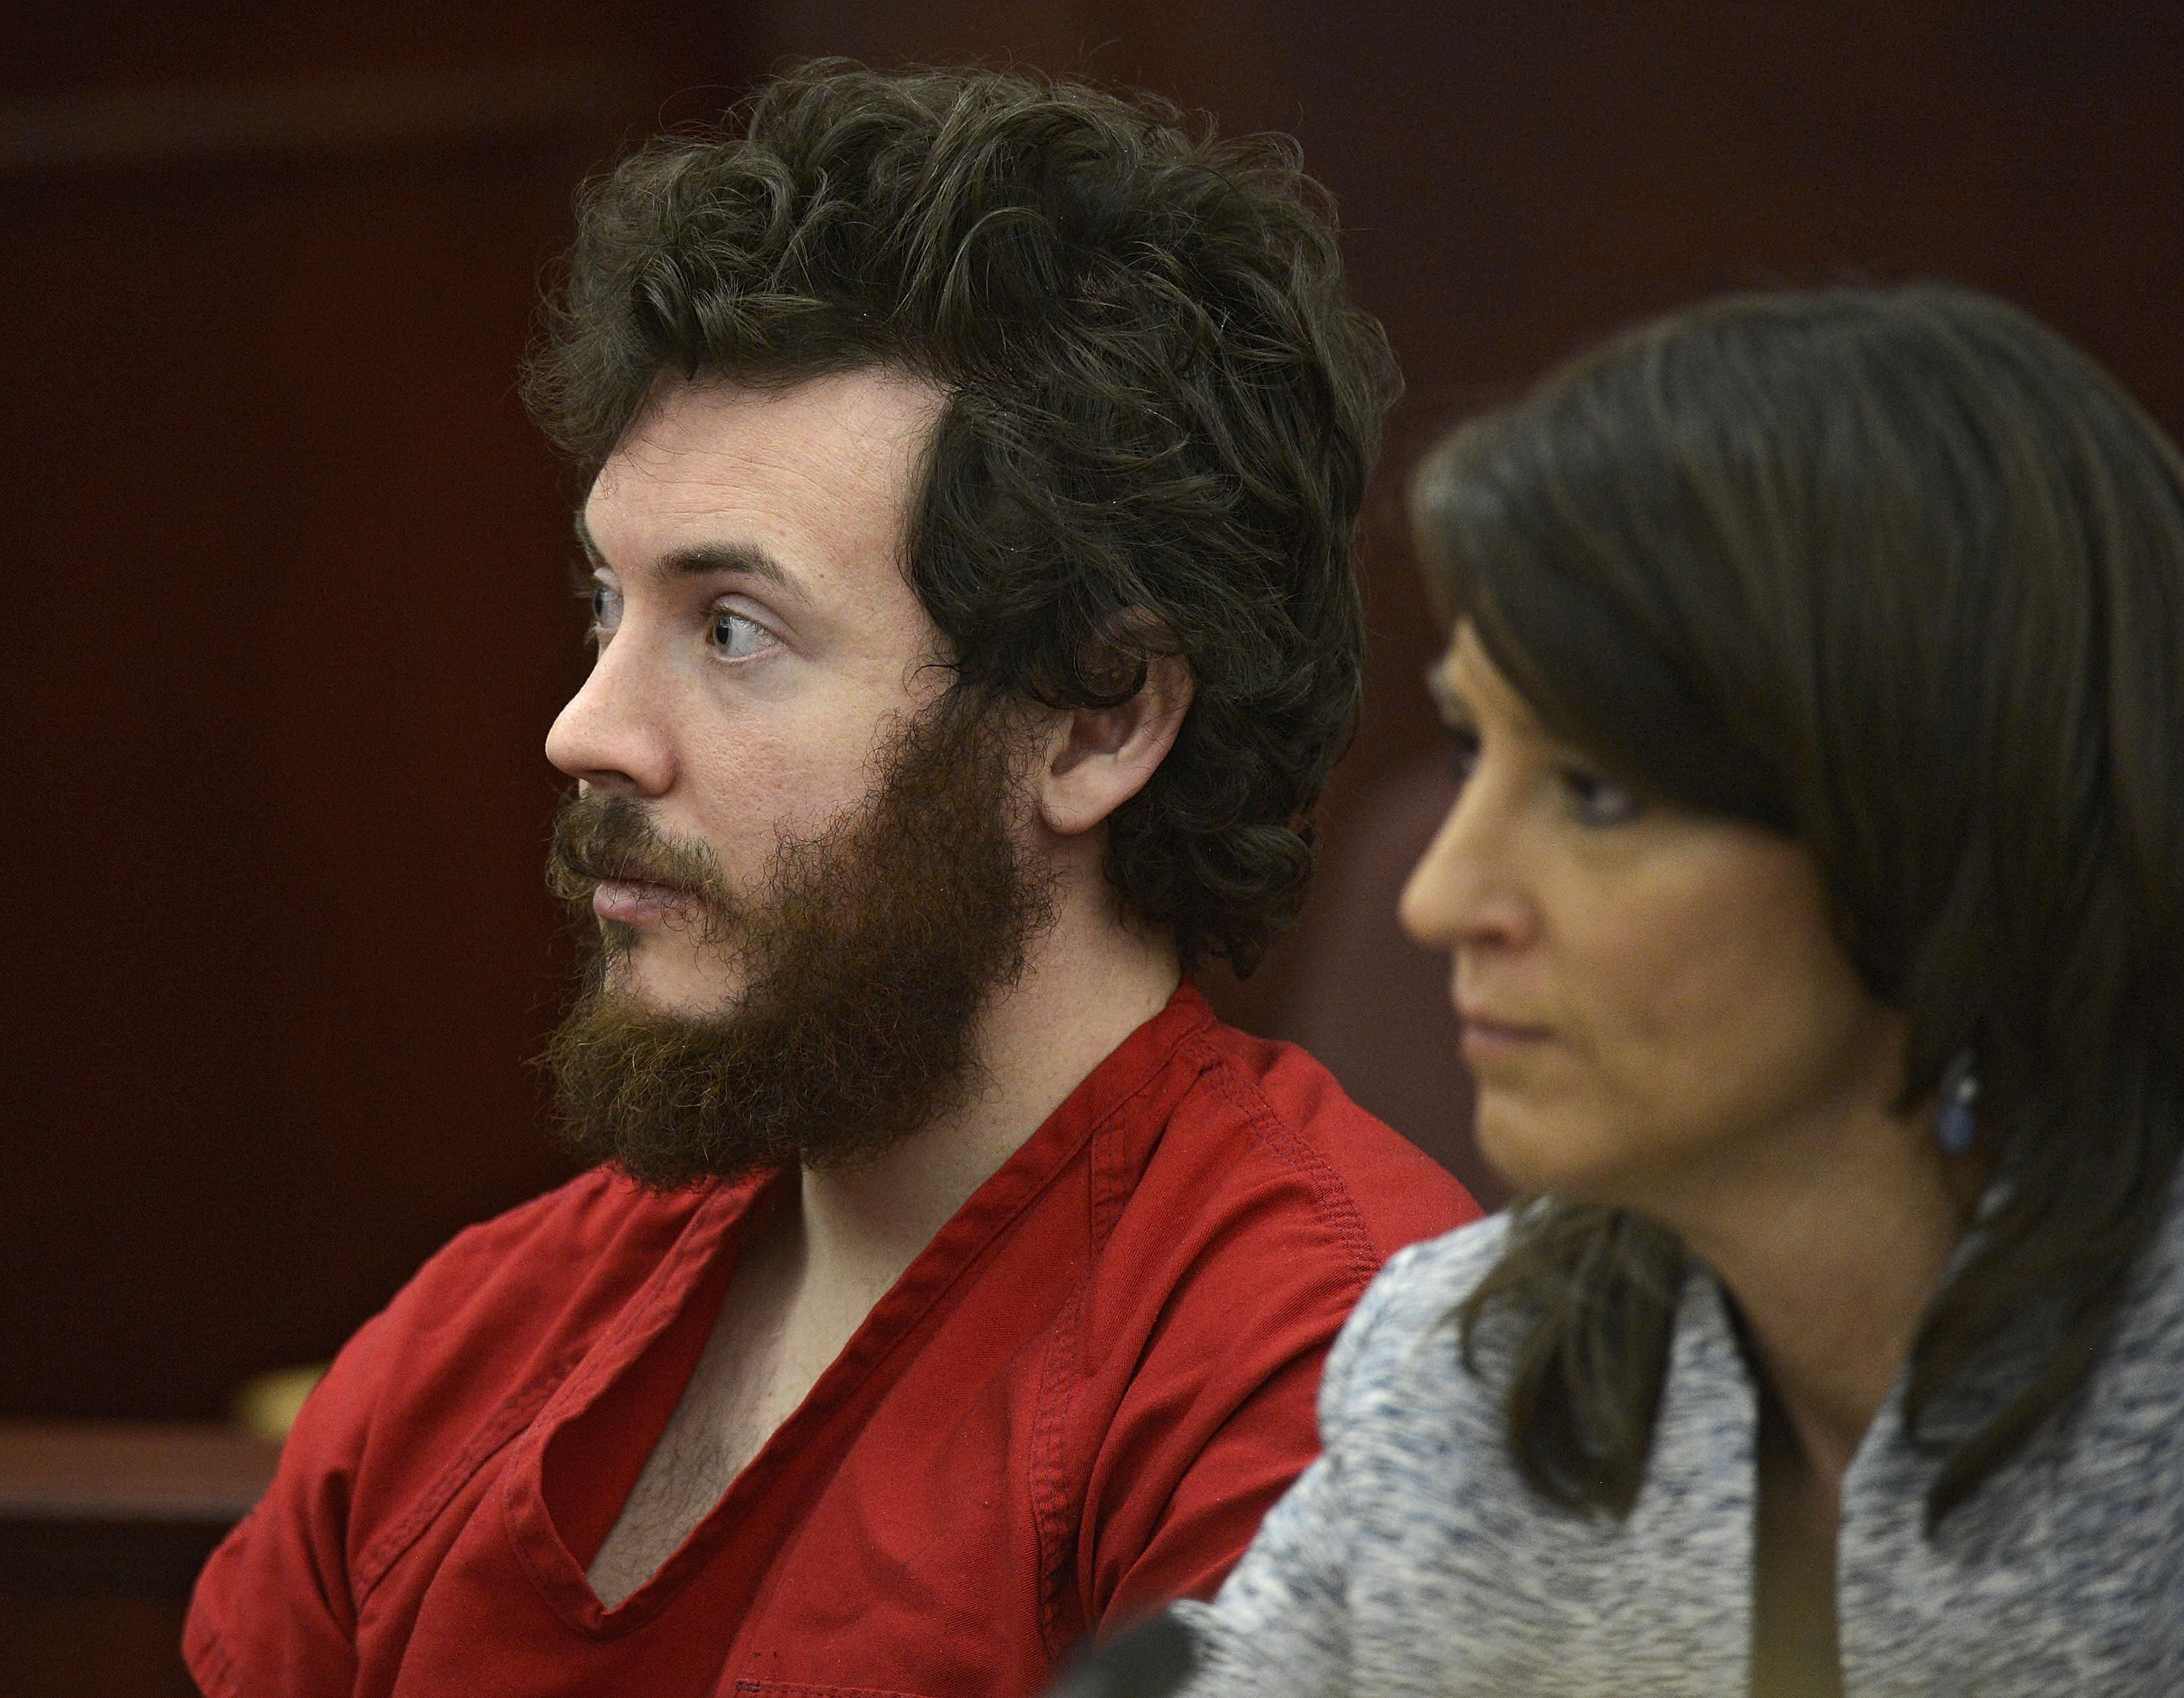 On video, theater gunman says killings got him 'value units'